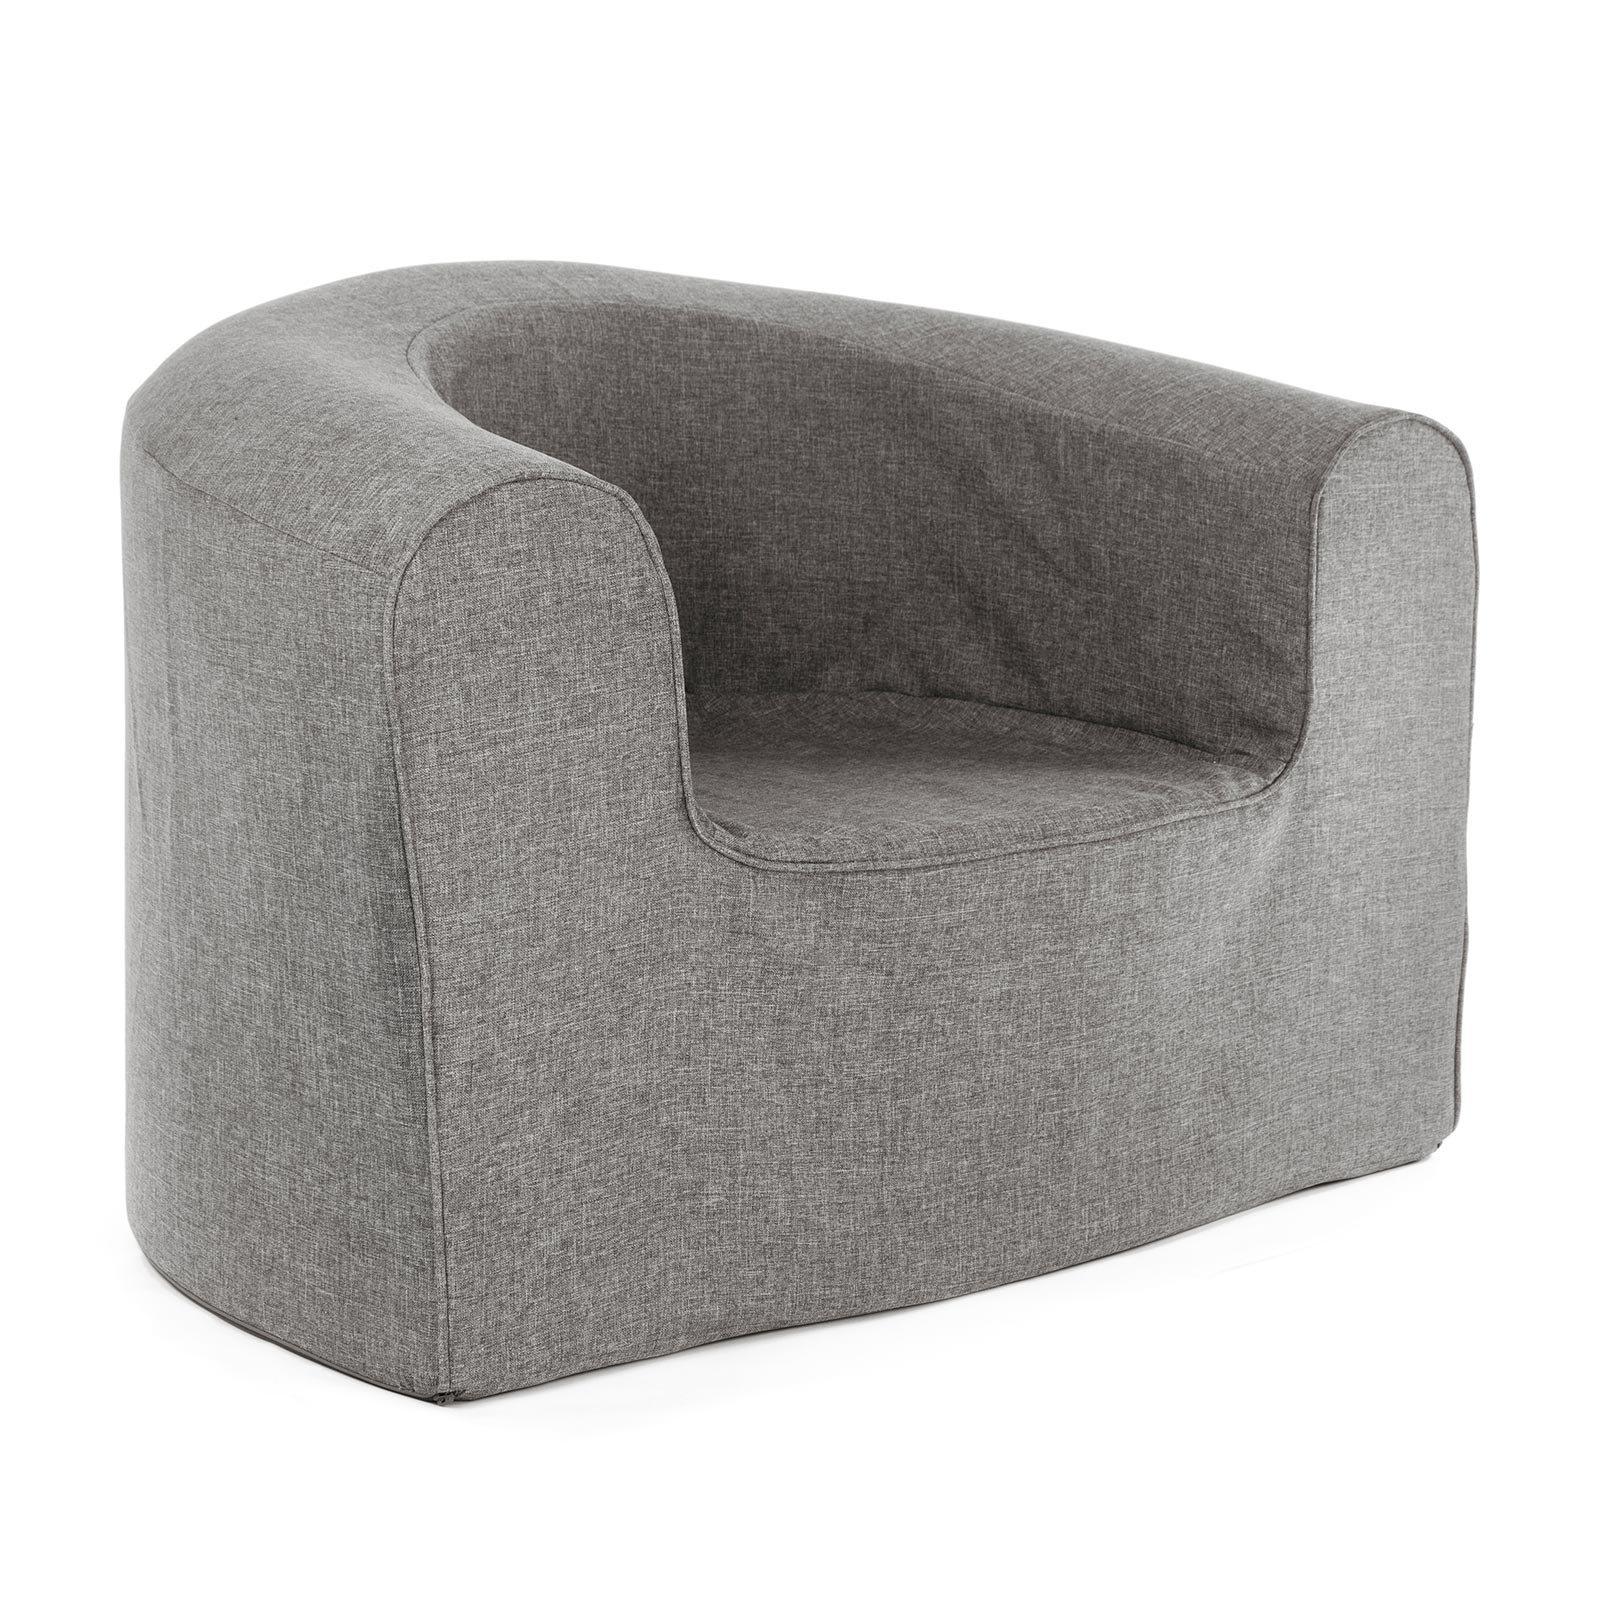 PopLounge Expandable Foam Furniture Armchair, Steeple Gray, 35'' x 28'' x 26''